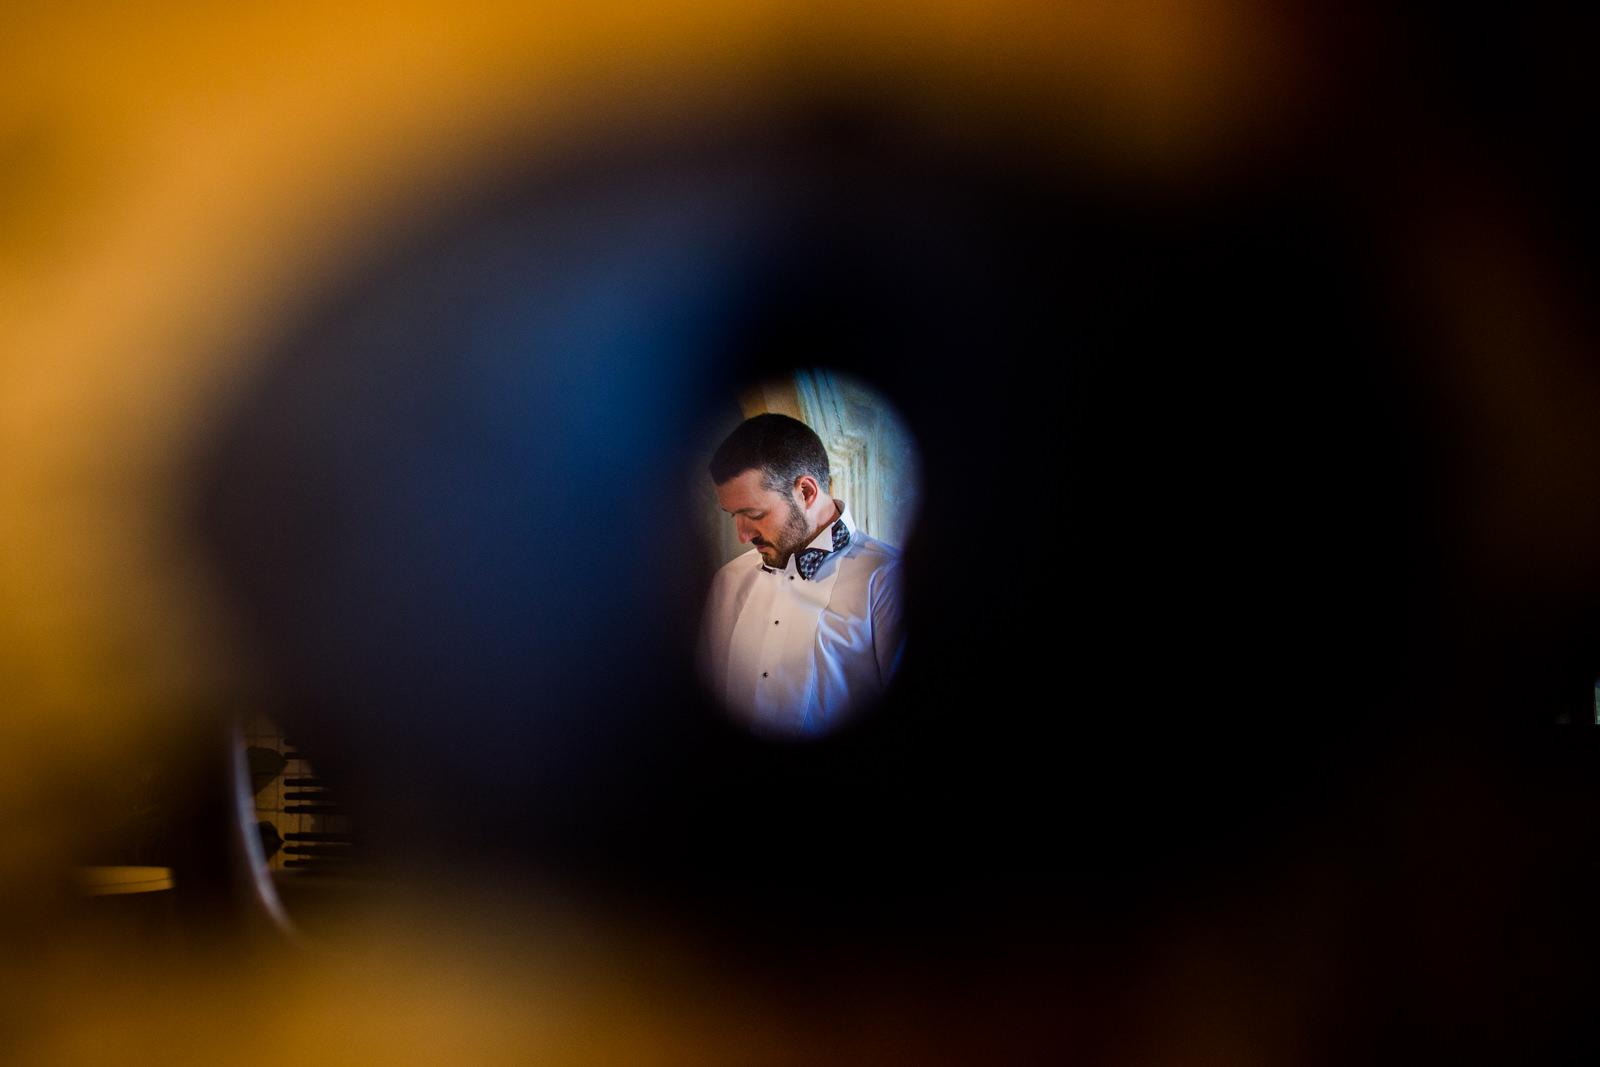 Almirall-Font-sitges-marbella-engagement-Rafael-Torres-fotografo-bodas-sevilla-madrid-barcelona-wedding-photographer--13.jpg